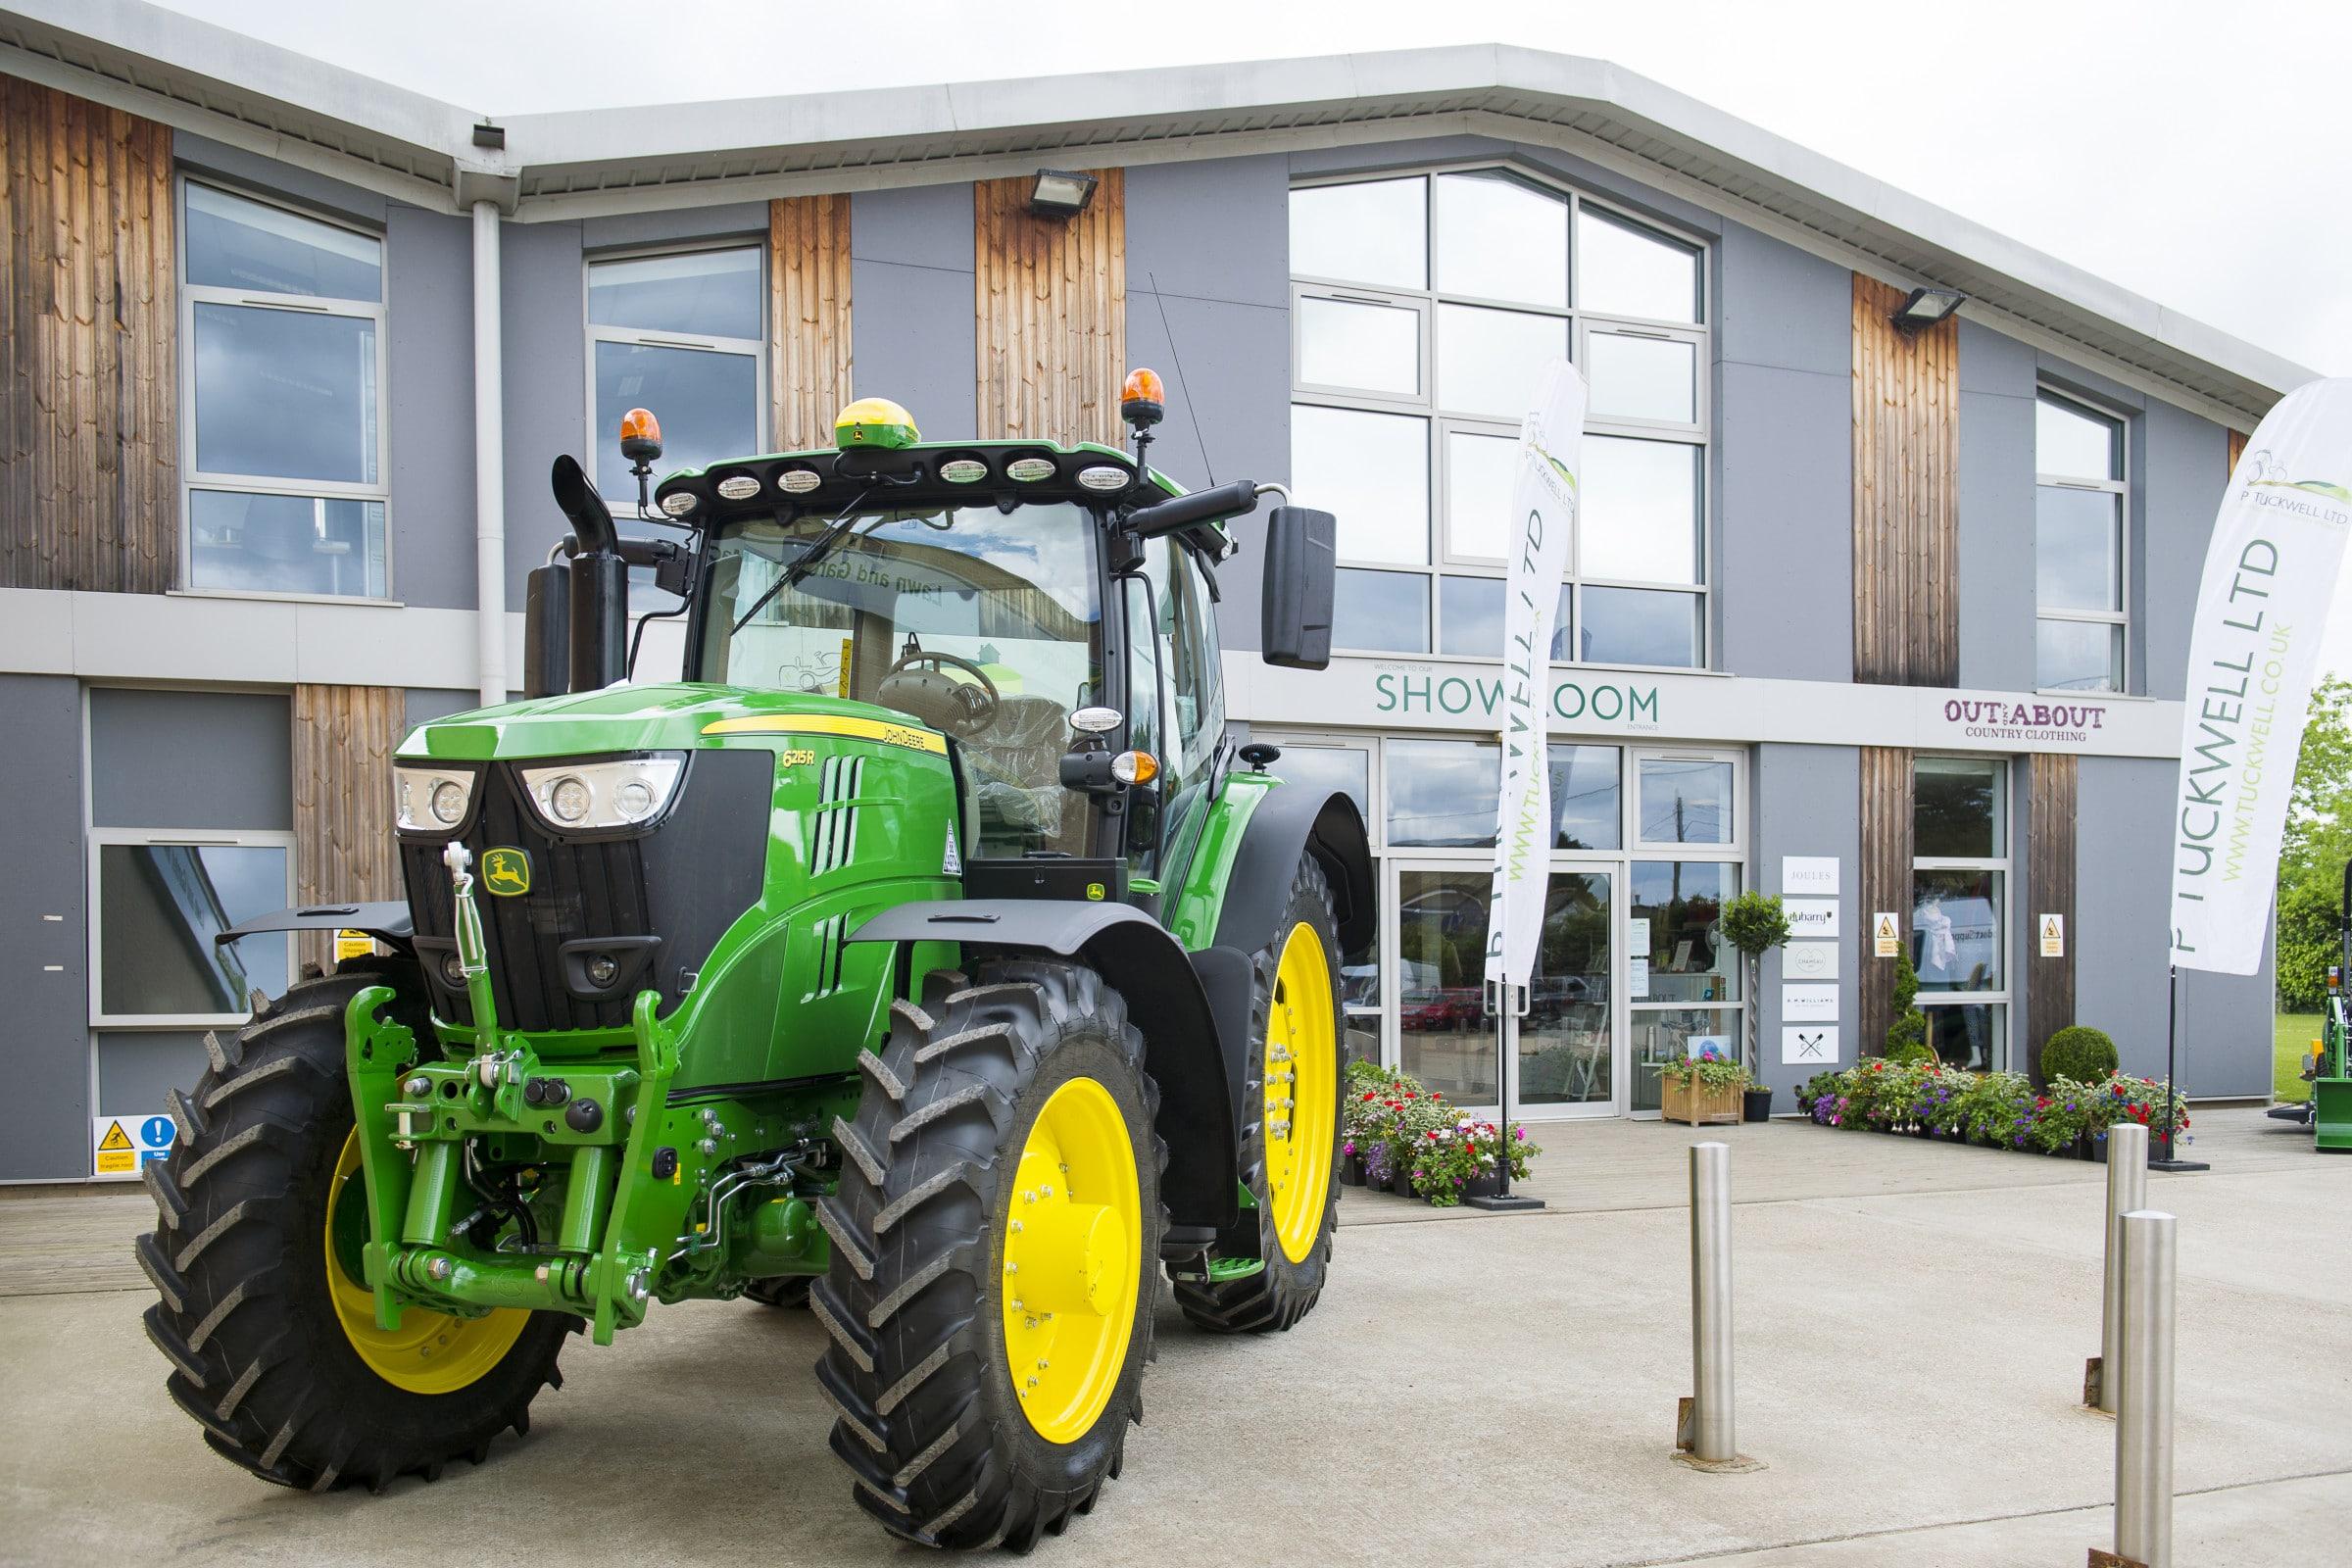 P Tuckwell Ltd announce intent to acquire Burden Bros Agri Ltd